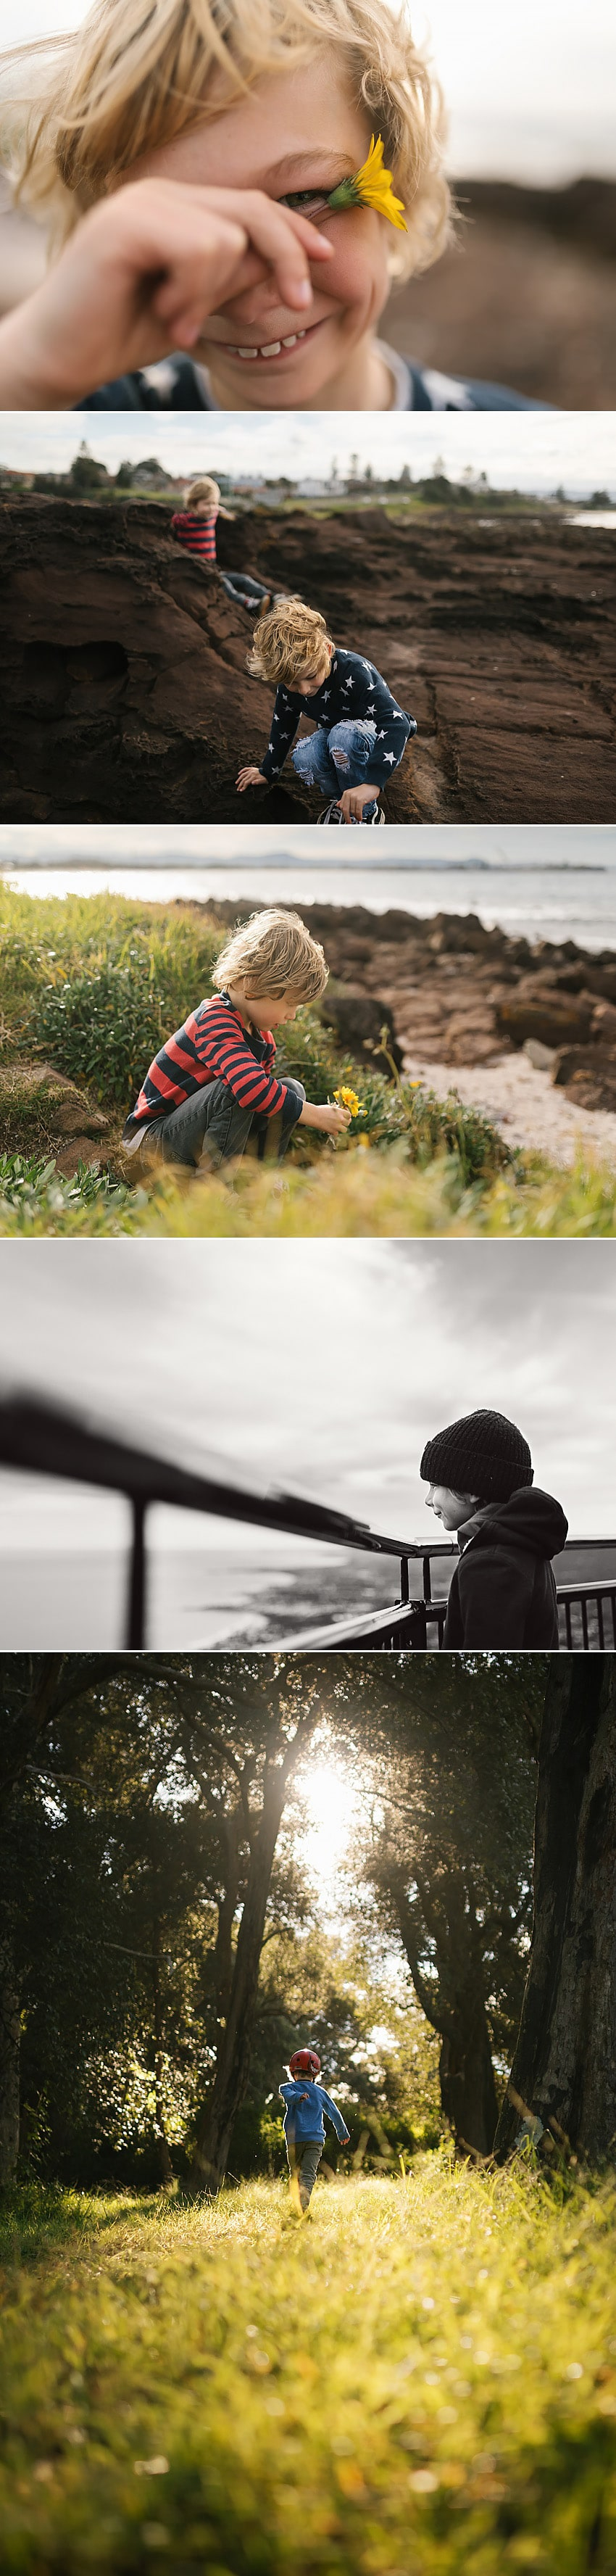 Lifestyle-family-Pgotographer-Sydney